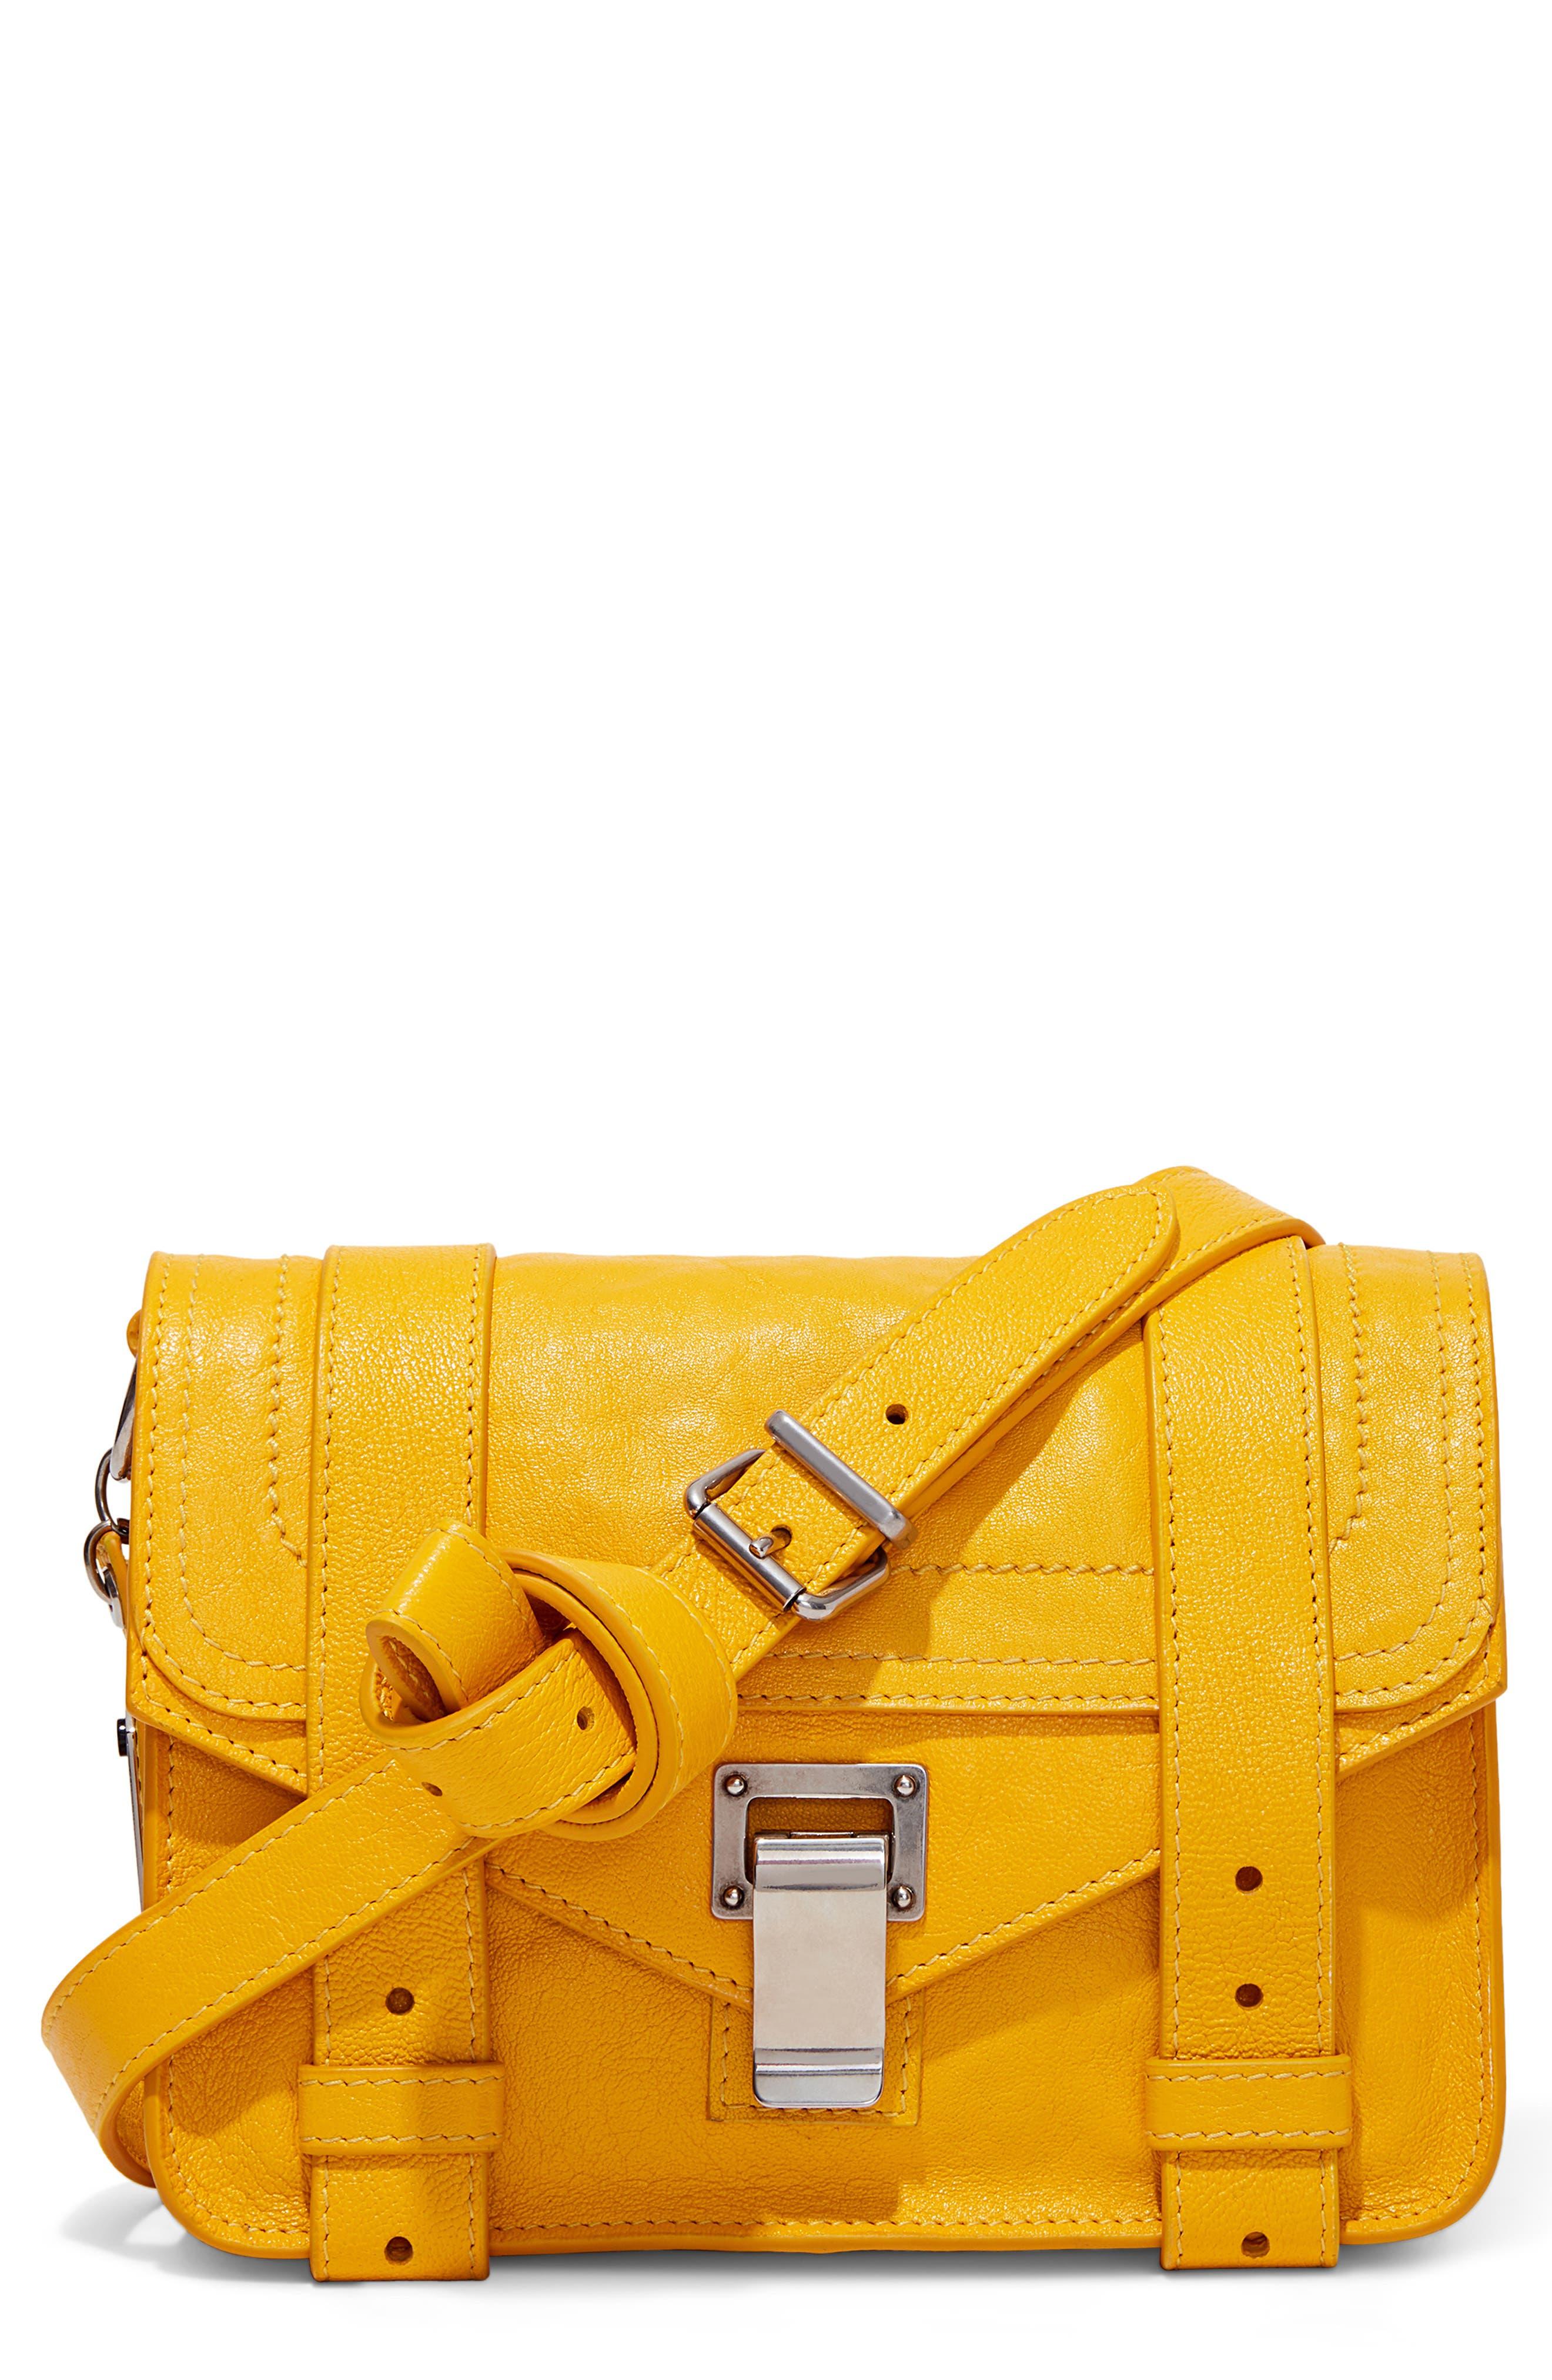 PROENZA SCHOULER, 'Mini PS1' Lambskin Leather Crossbody Bag, Main thumbnail 1, color, LEMON CHROME